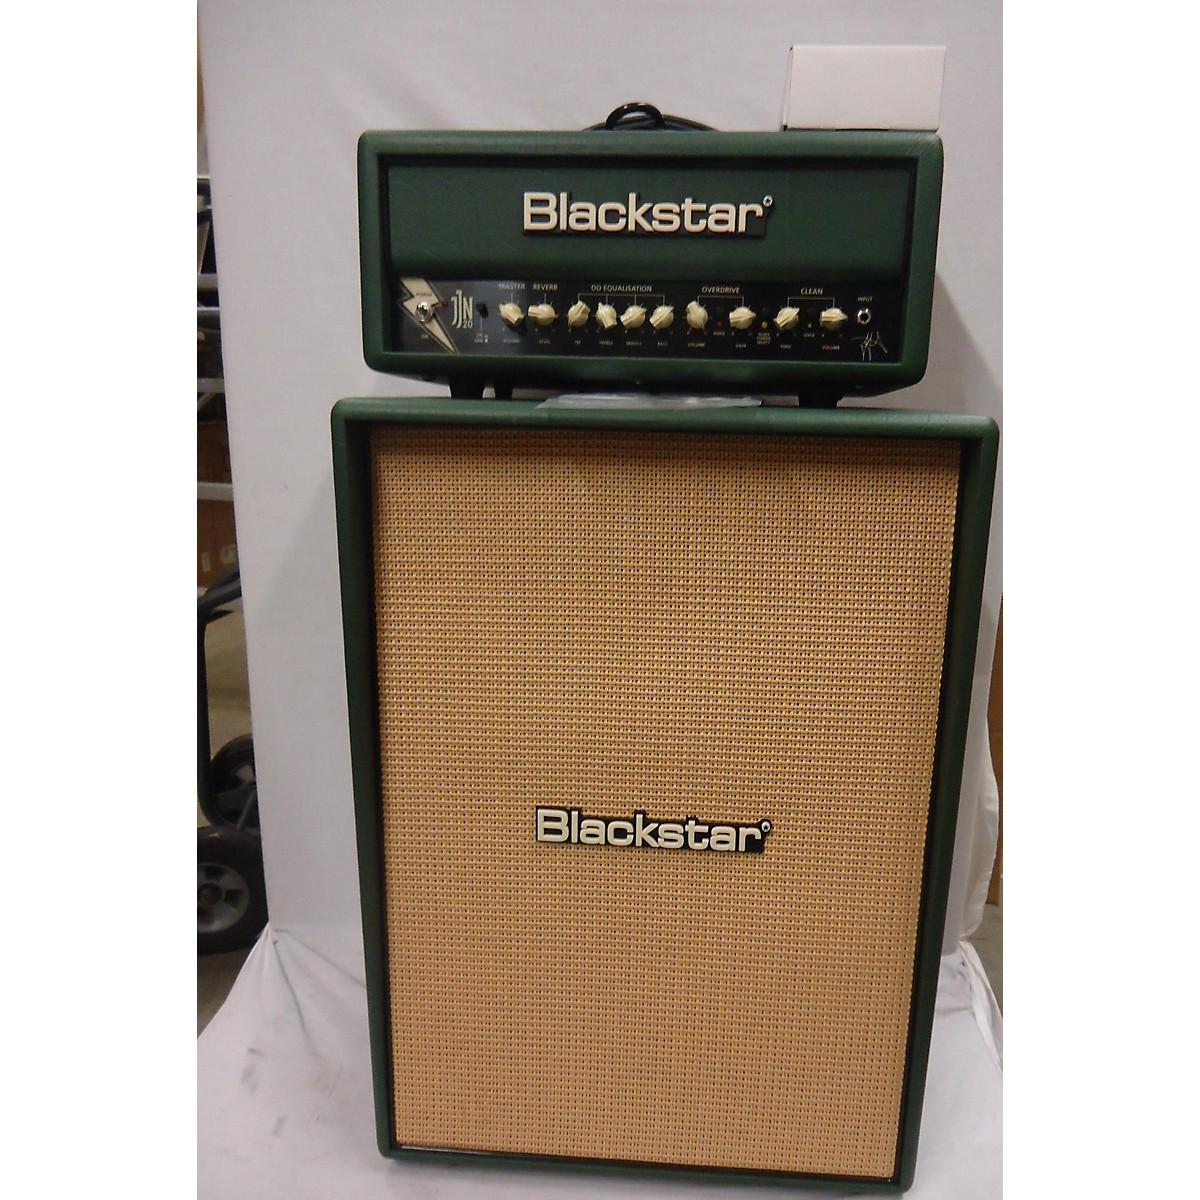 Blackstar Jjn20 Guitar Stack